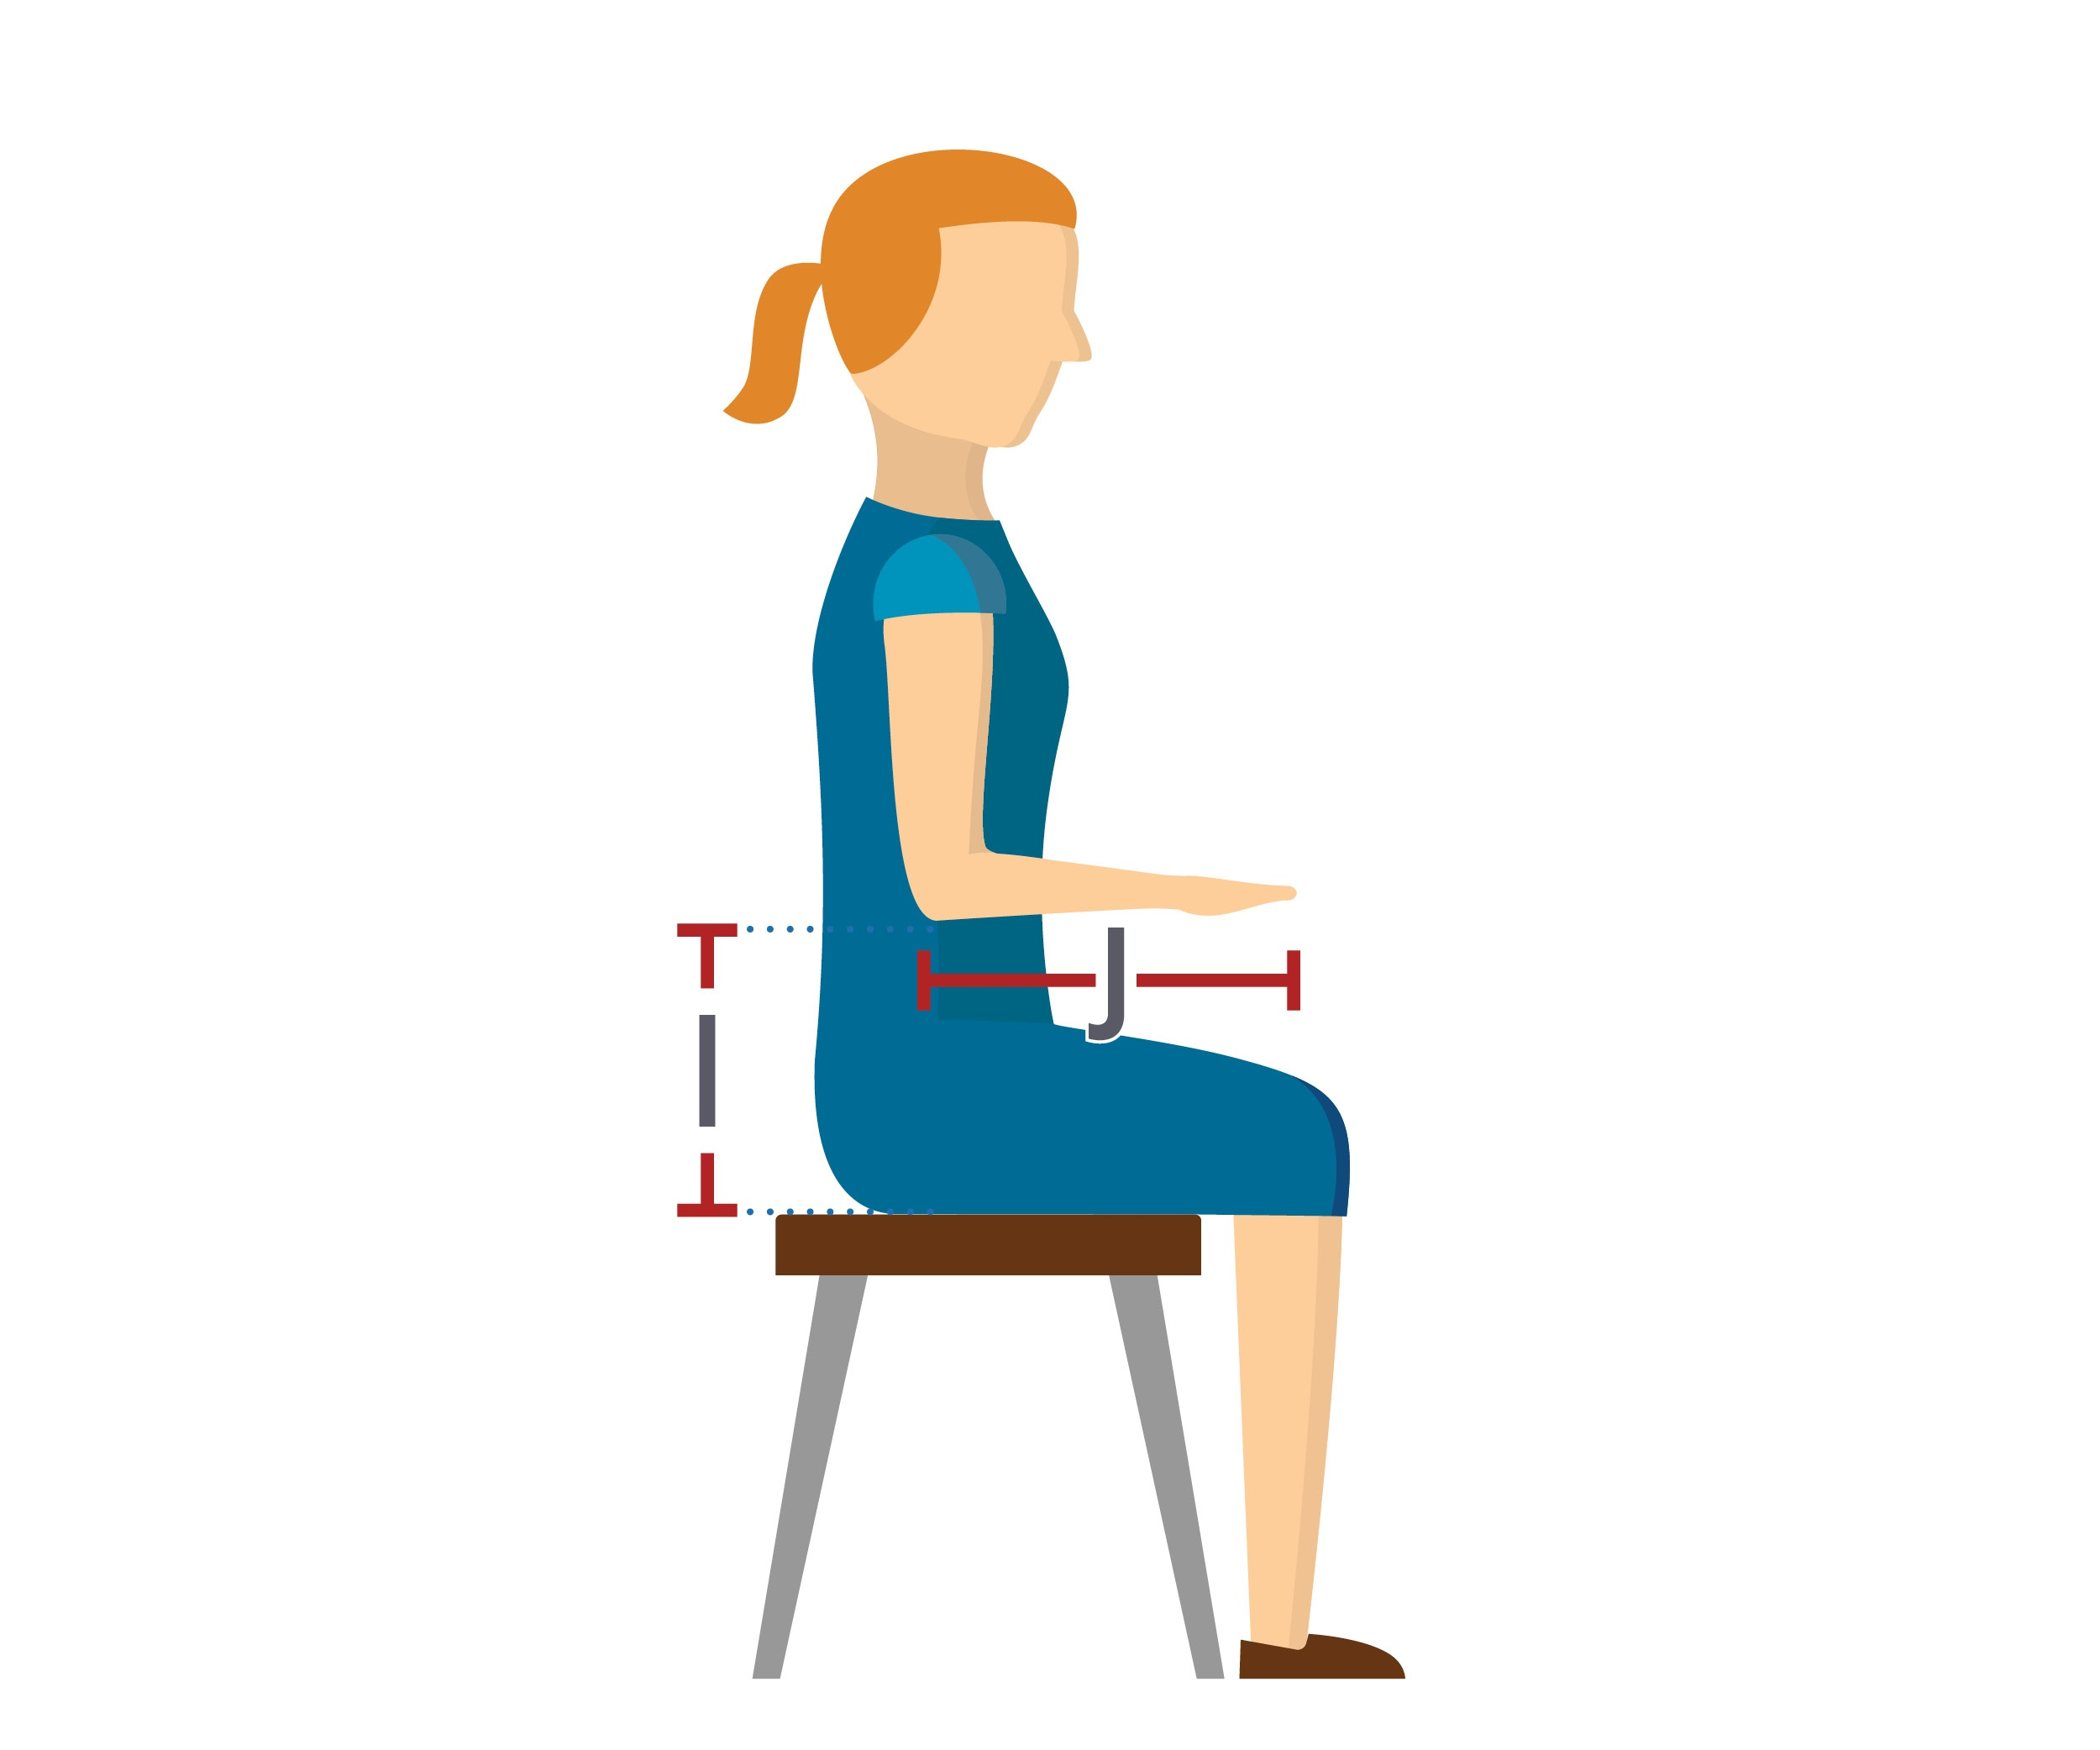 Wheelchair_ArmRest_Measuring_Guide - Arm Rest